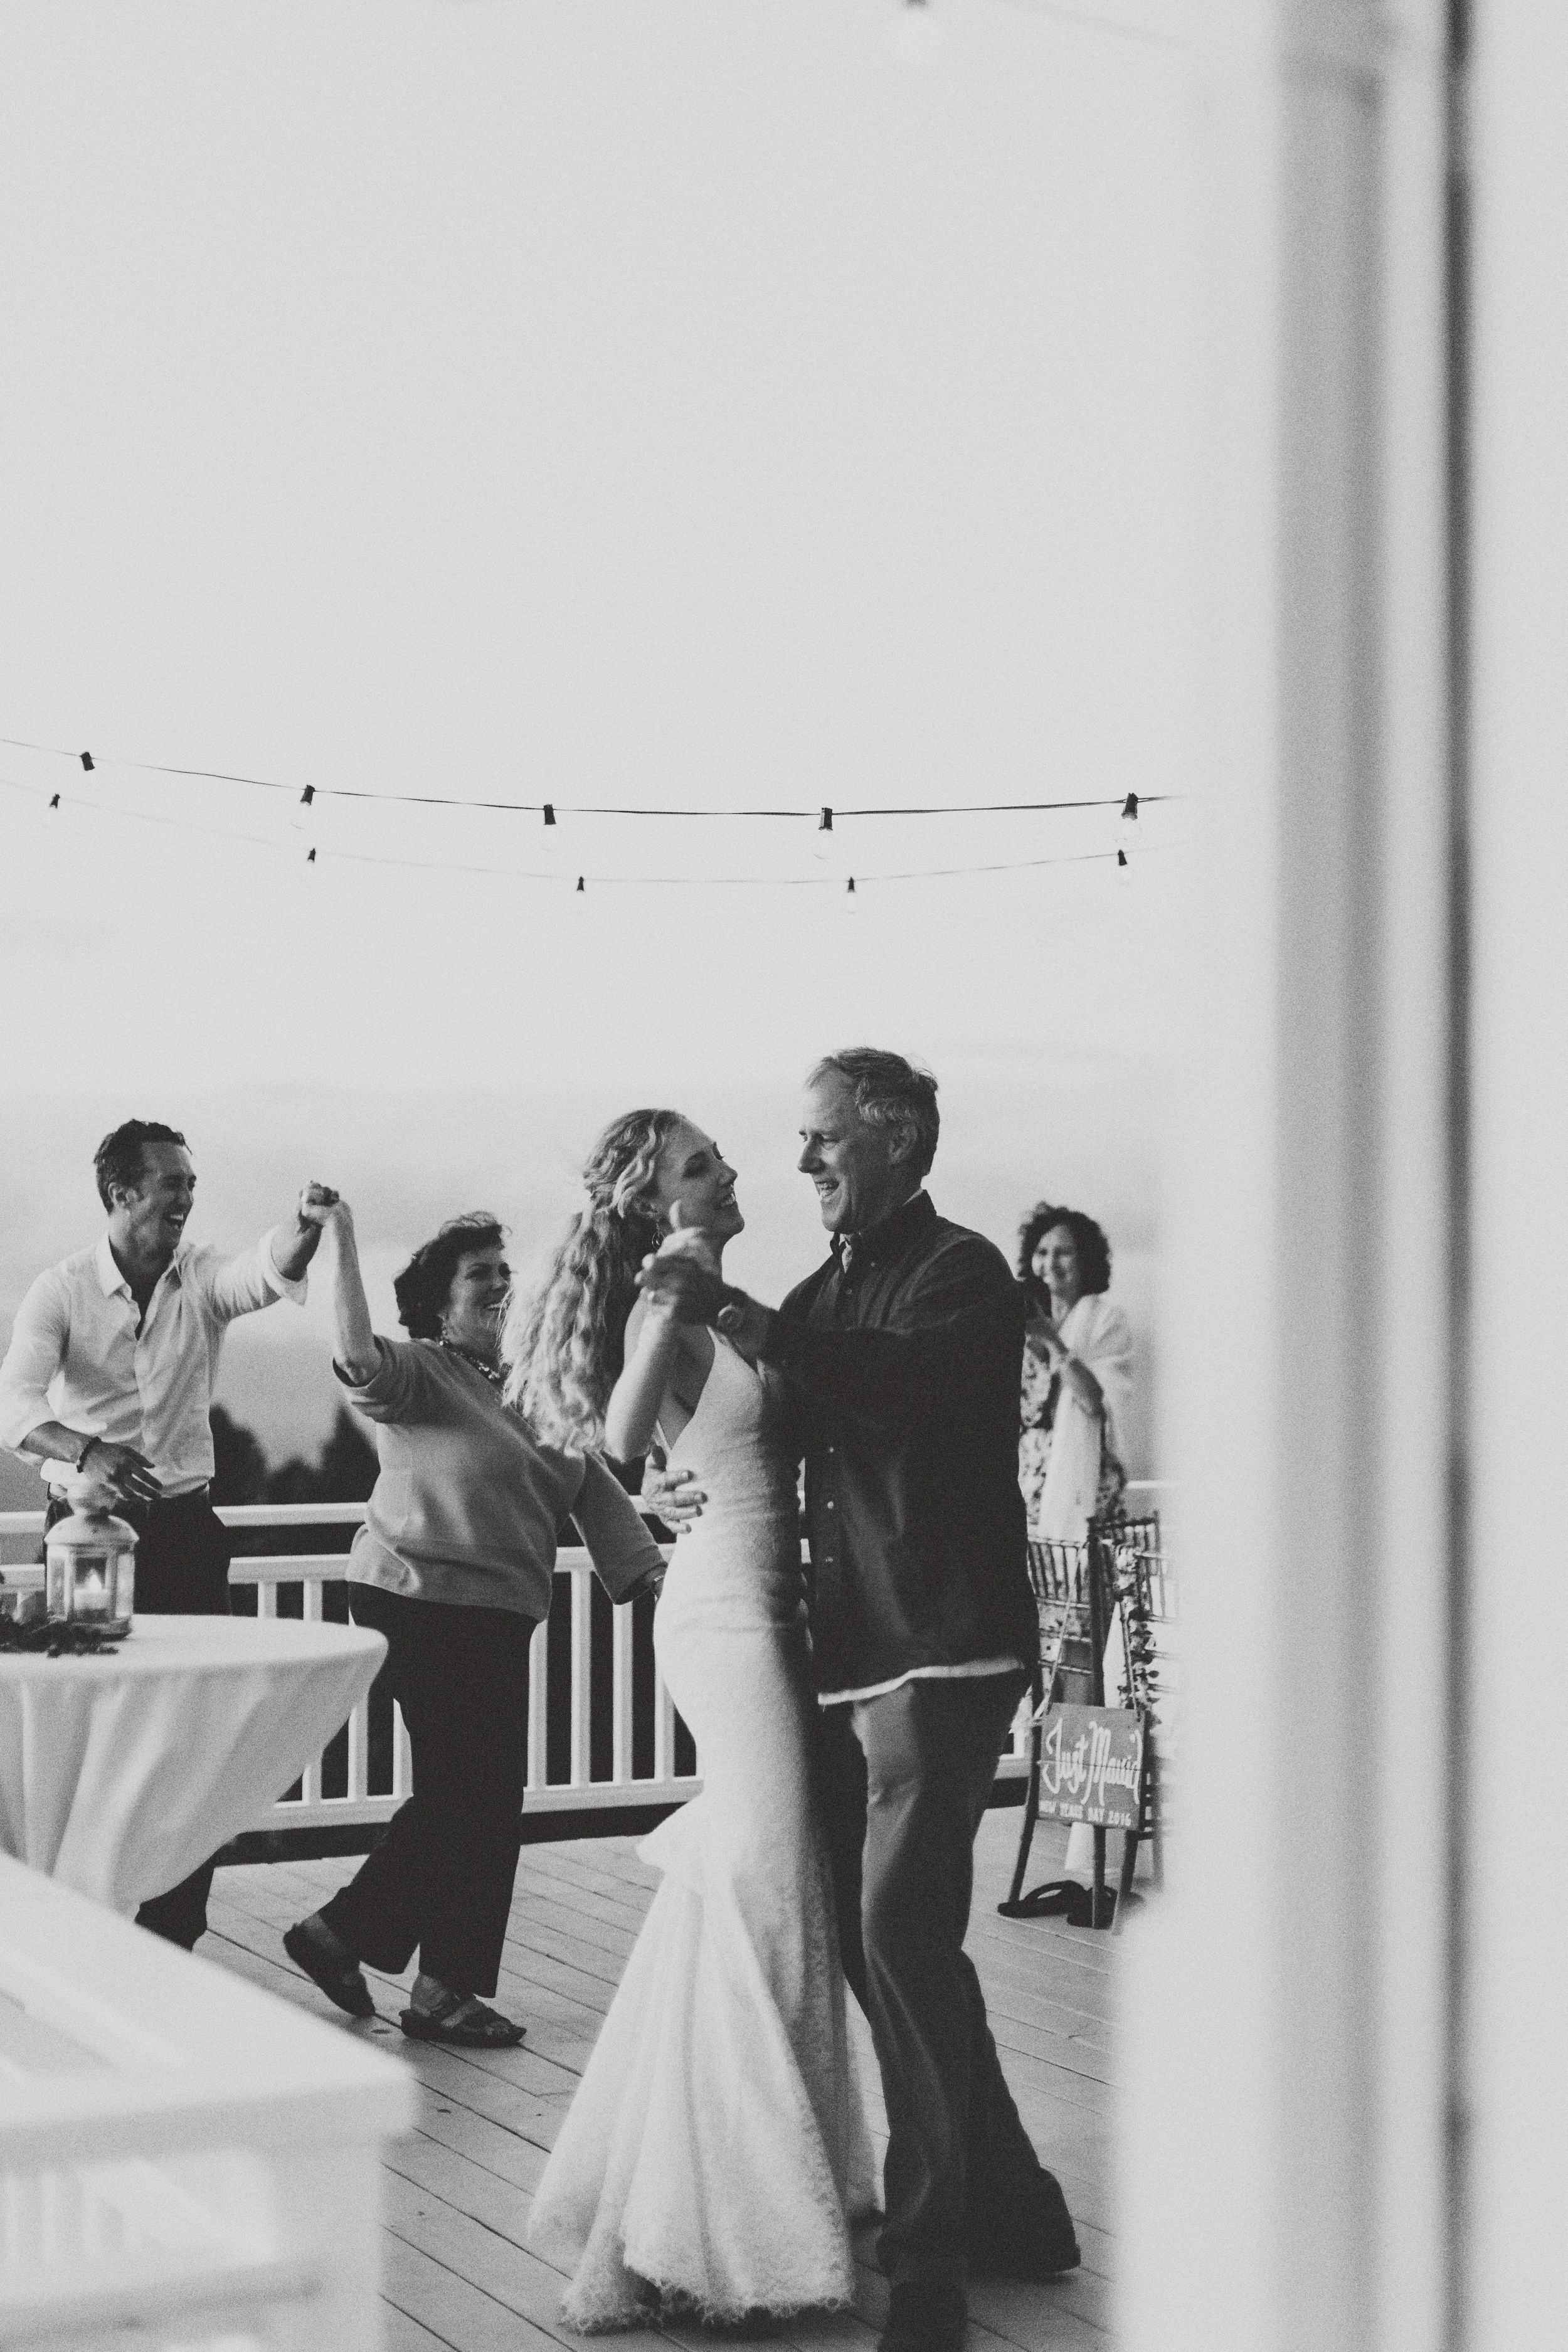 angie-diaz-photography-maui-wedding-118.jpg